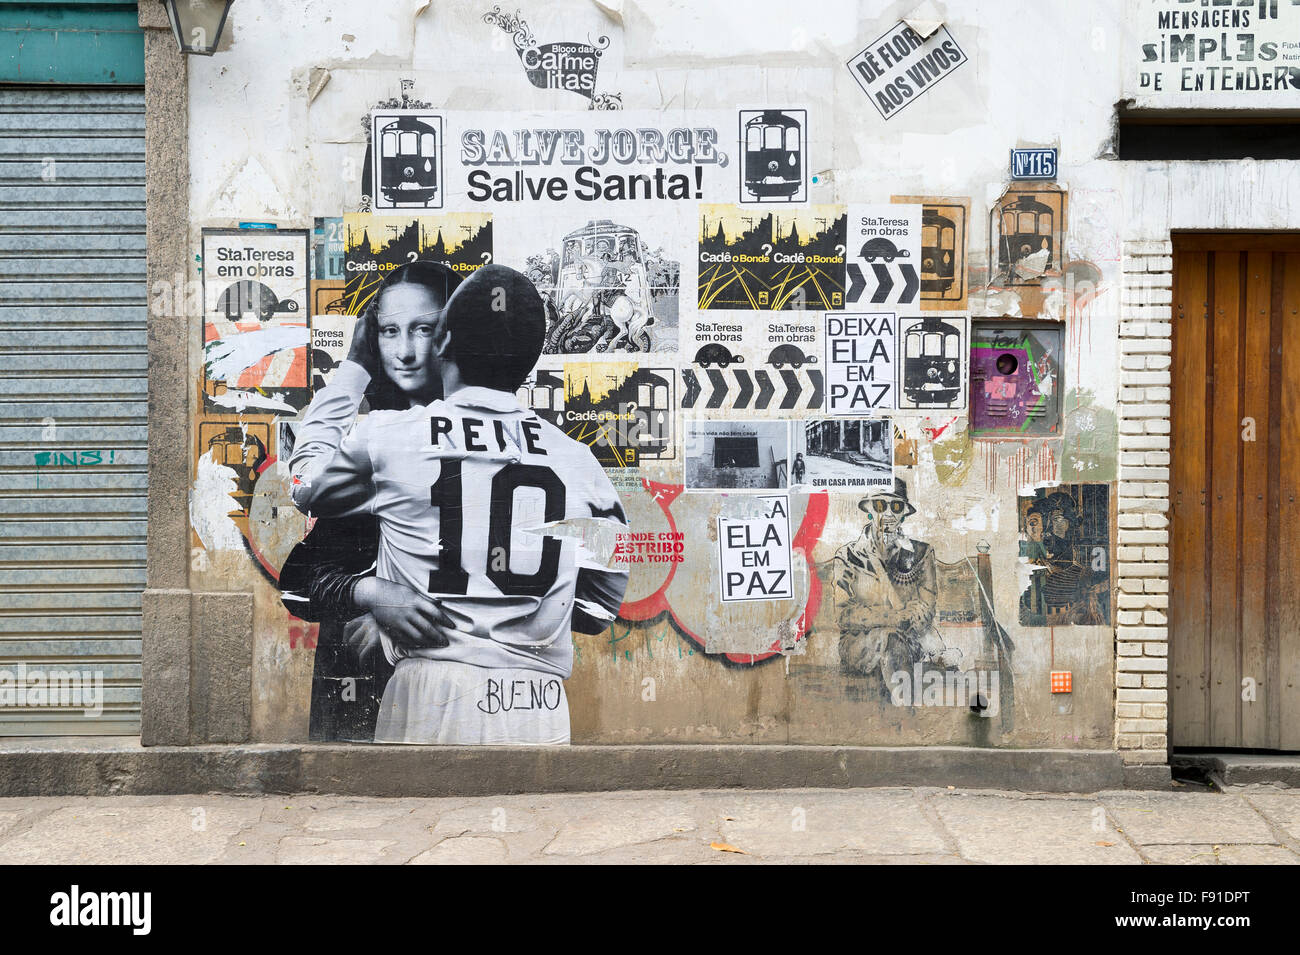 RIO DE JANEIRO, BRAZIL - OCTOBER 22, 2015: Street art depicting an intimate embrace between the football star Pele - Stock Image